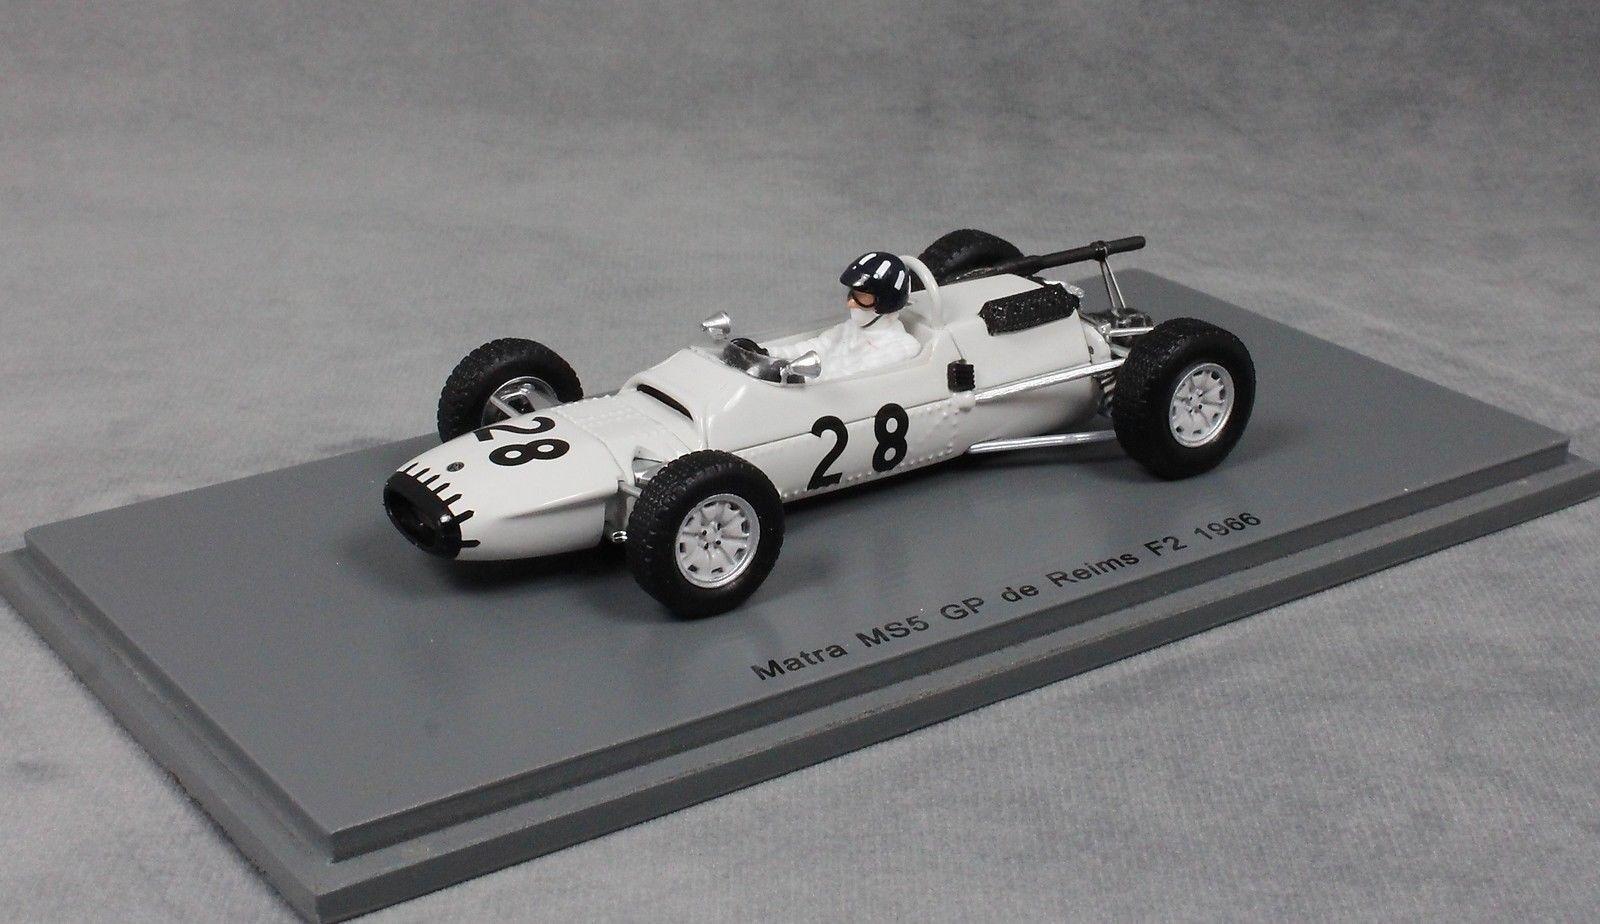 SPARK MATRA MS5 F2 REIMS REIMS REIMS GRAND PRIX 1966 Graham Hill S5411  NUOVO cefa45